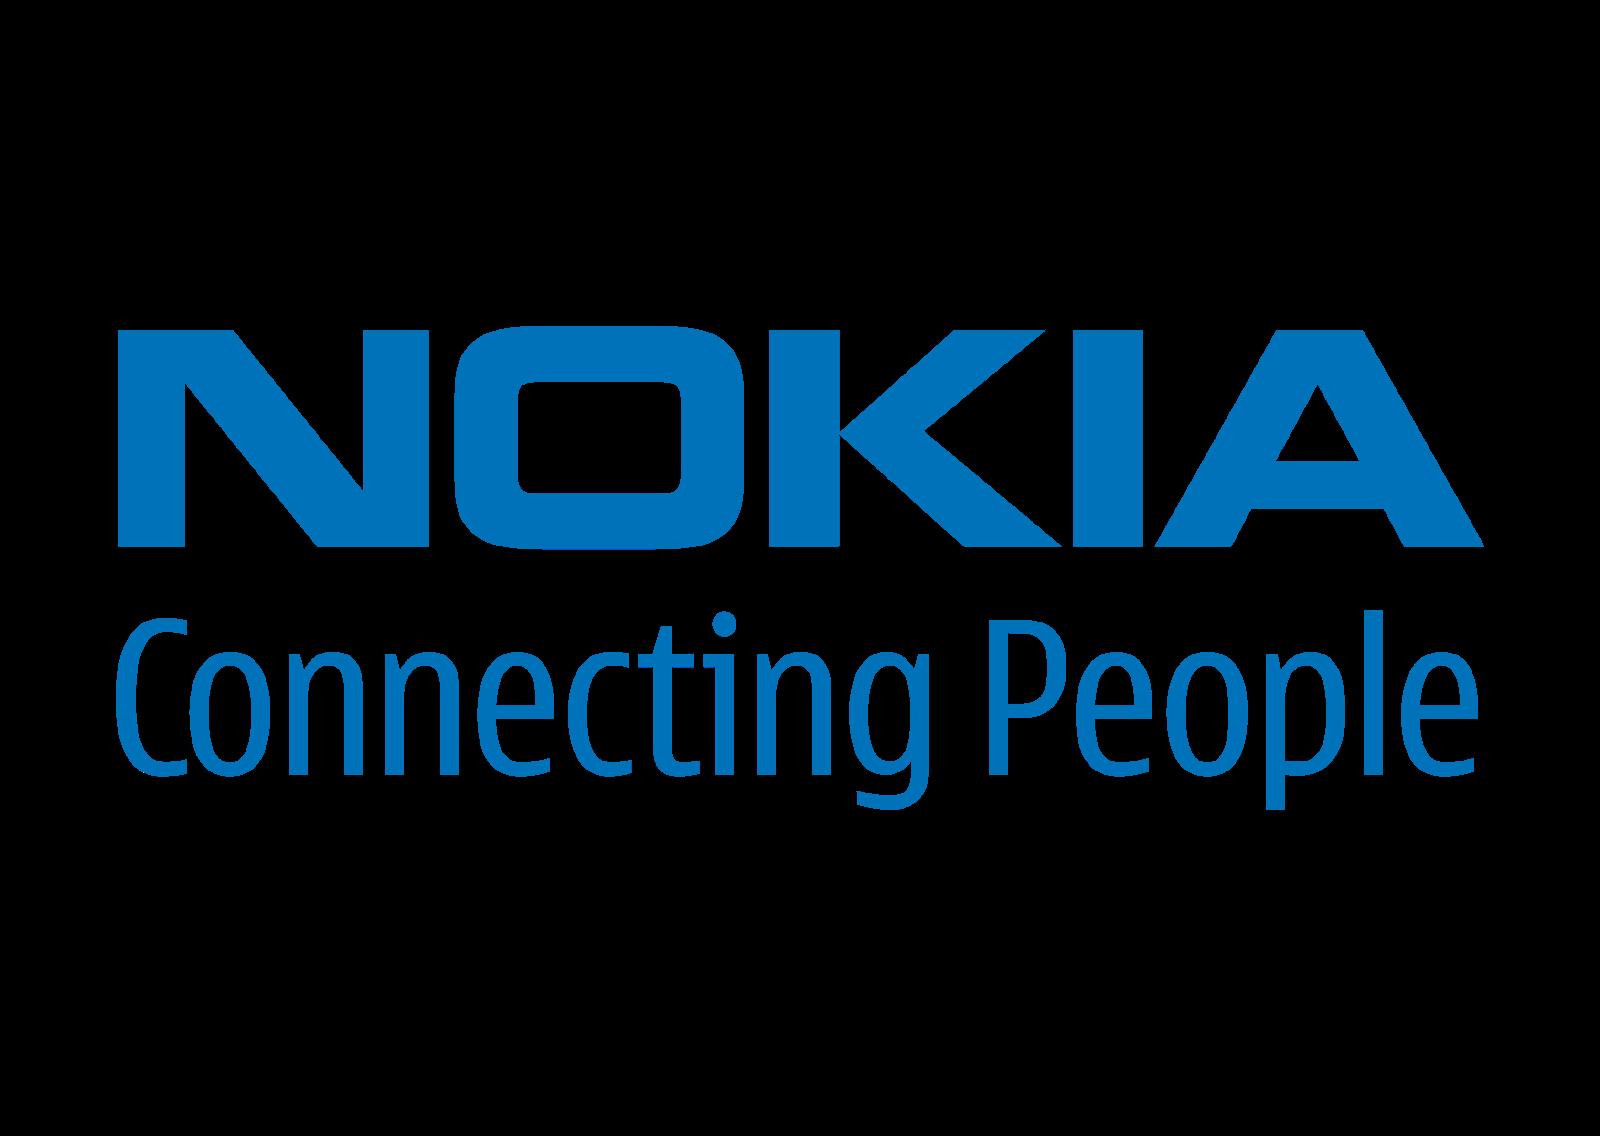 nokia connecting people logo -#main